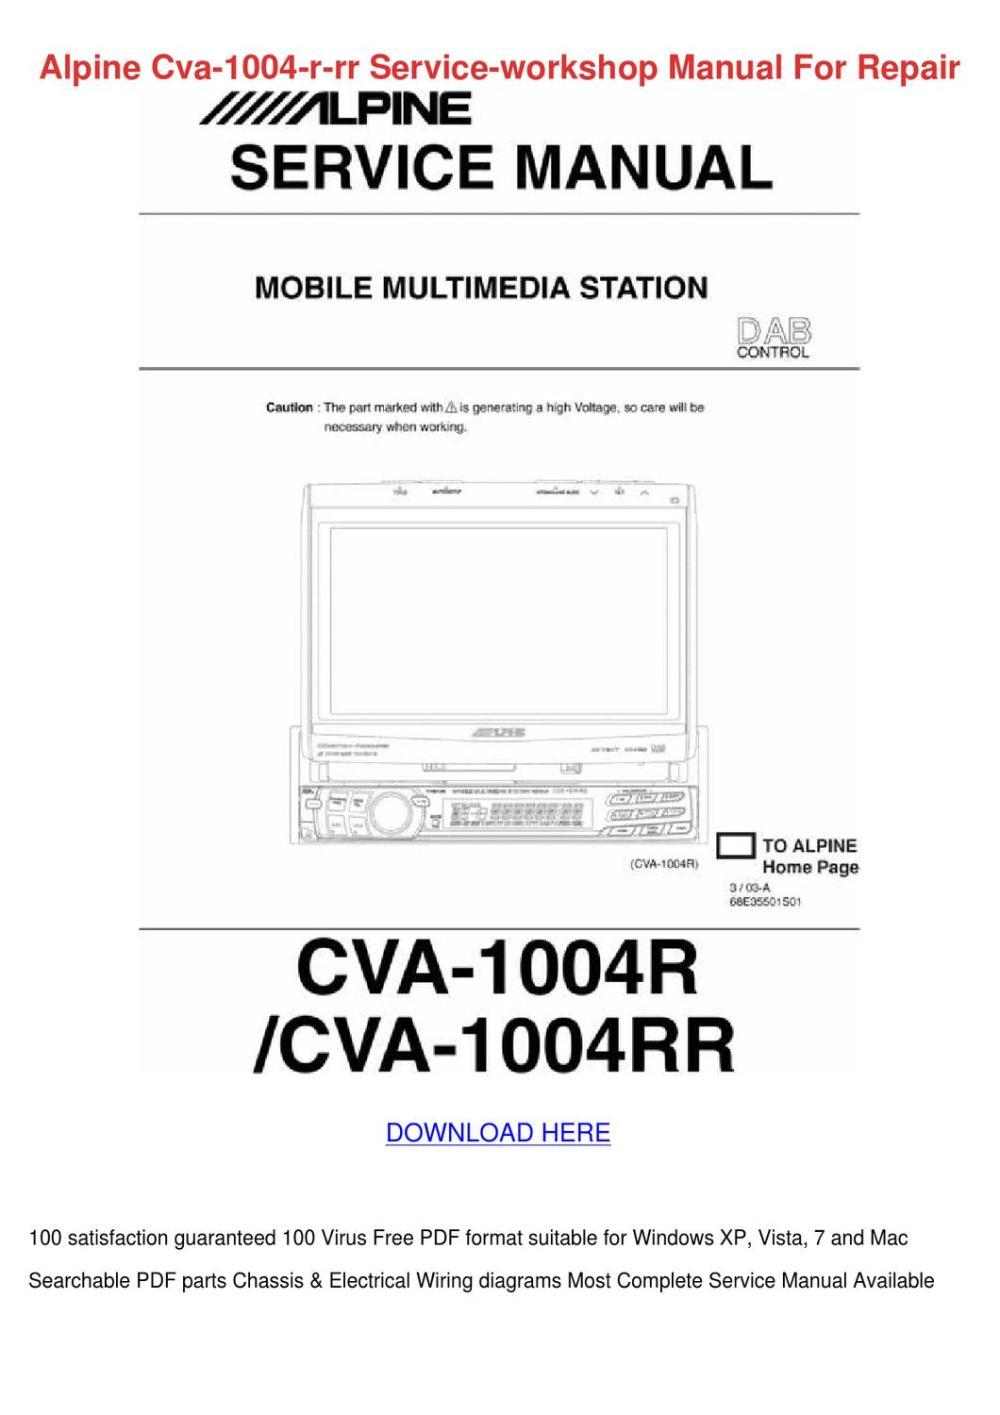 medium resolution of alpine cva 1004 r rr service workshop manual